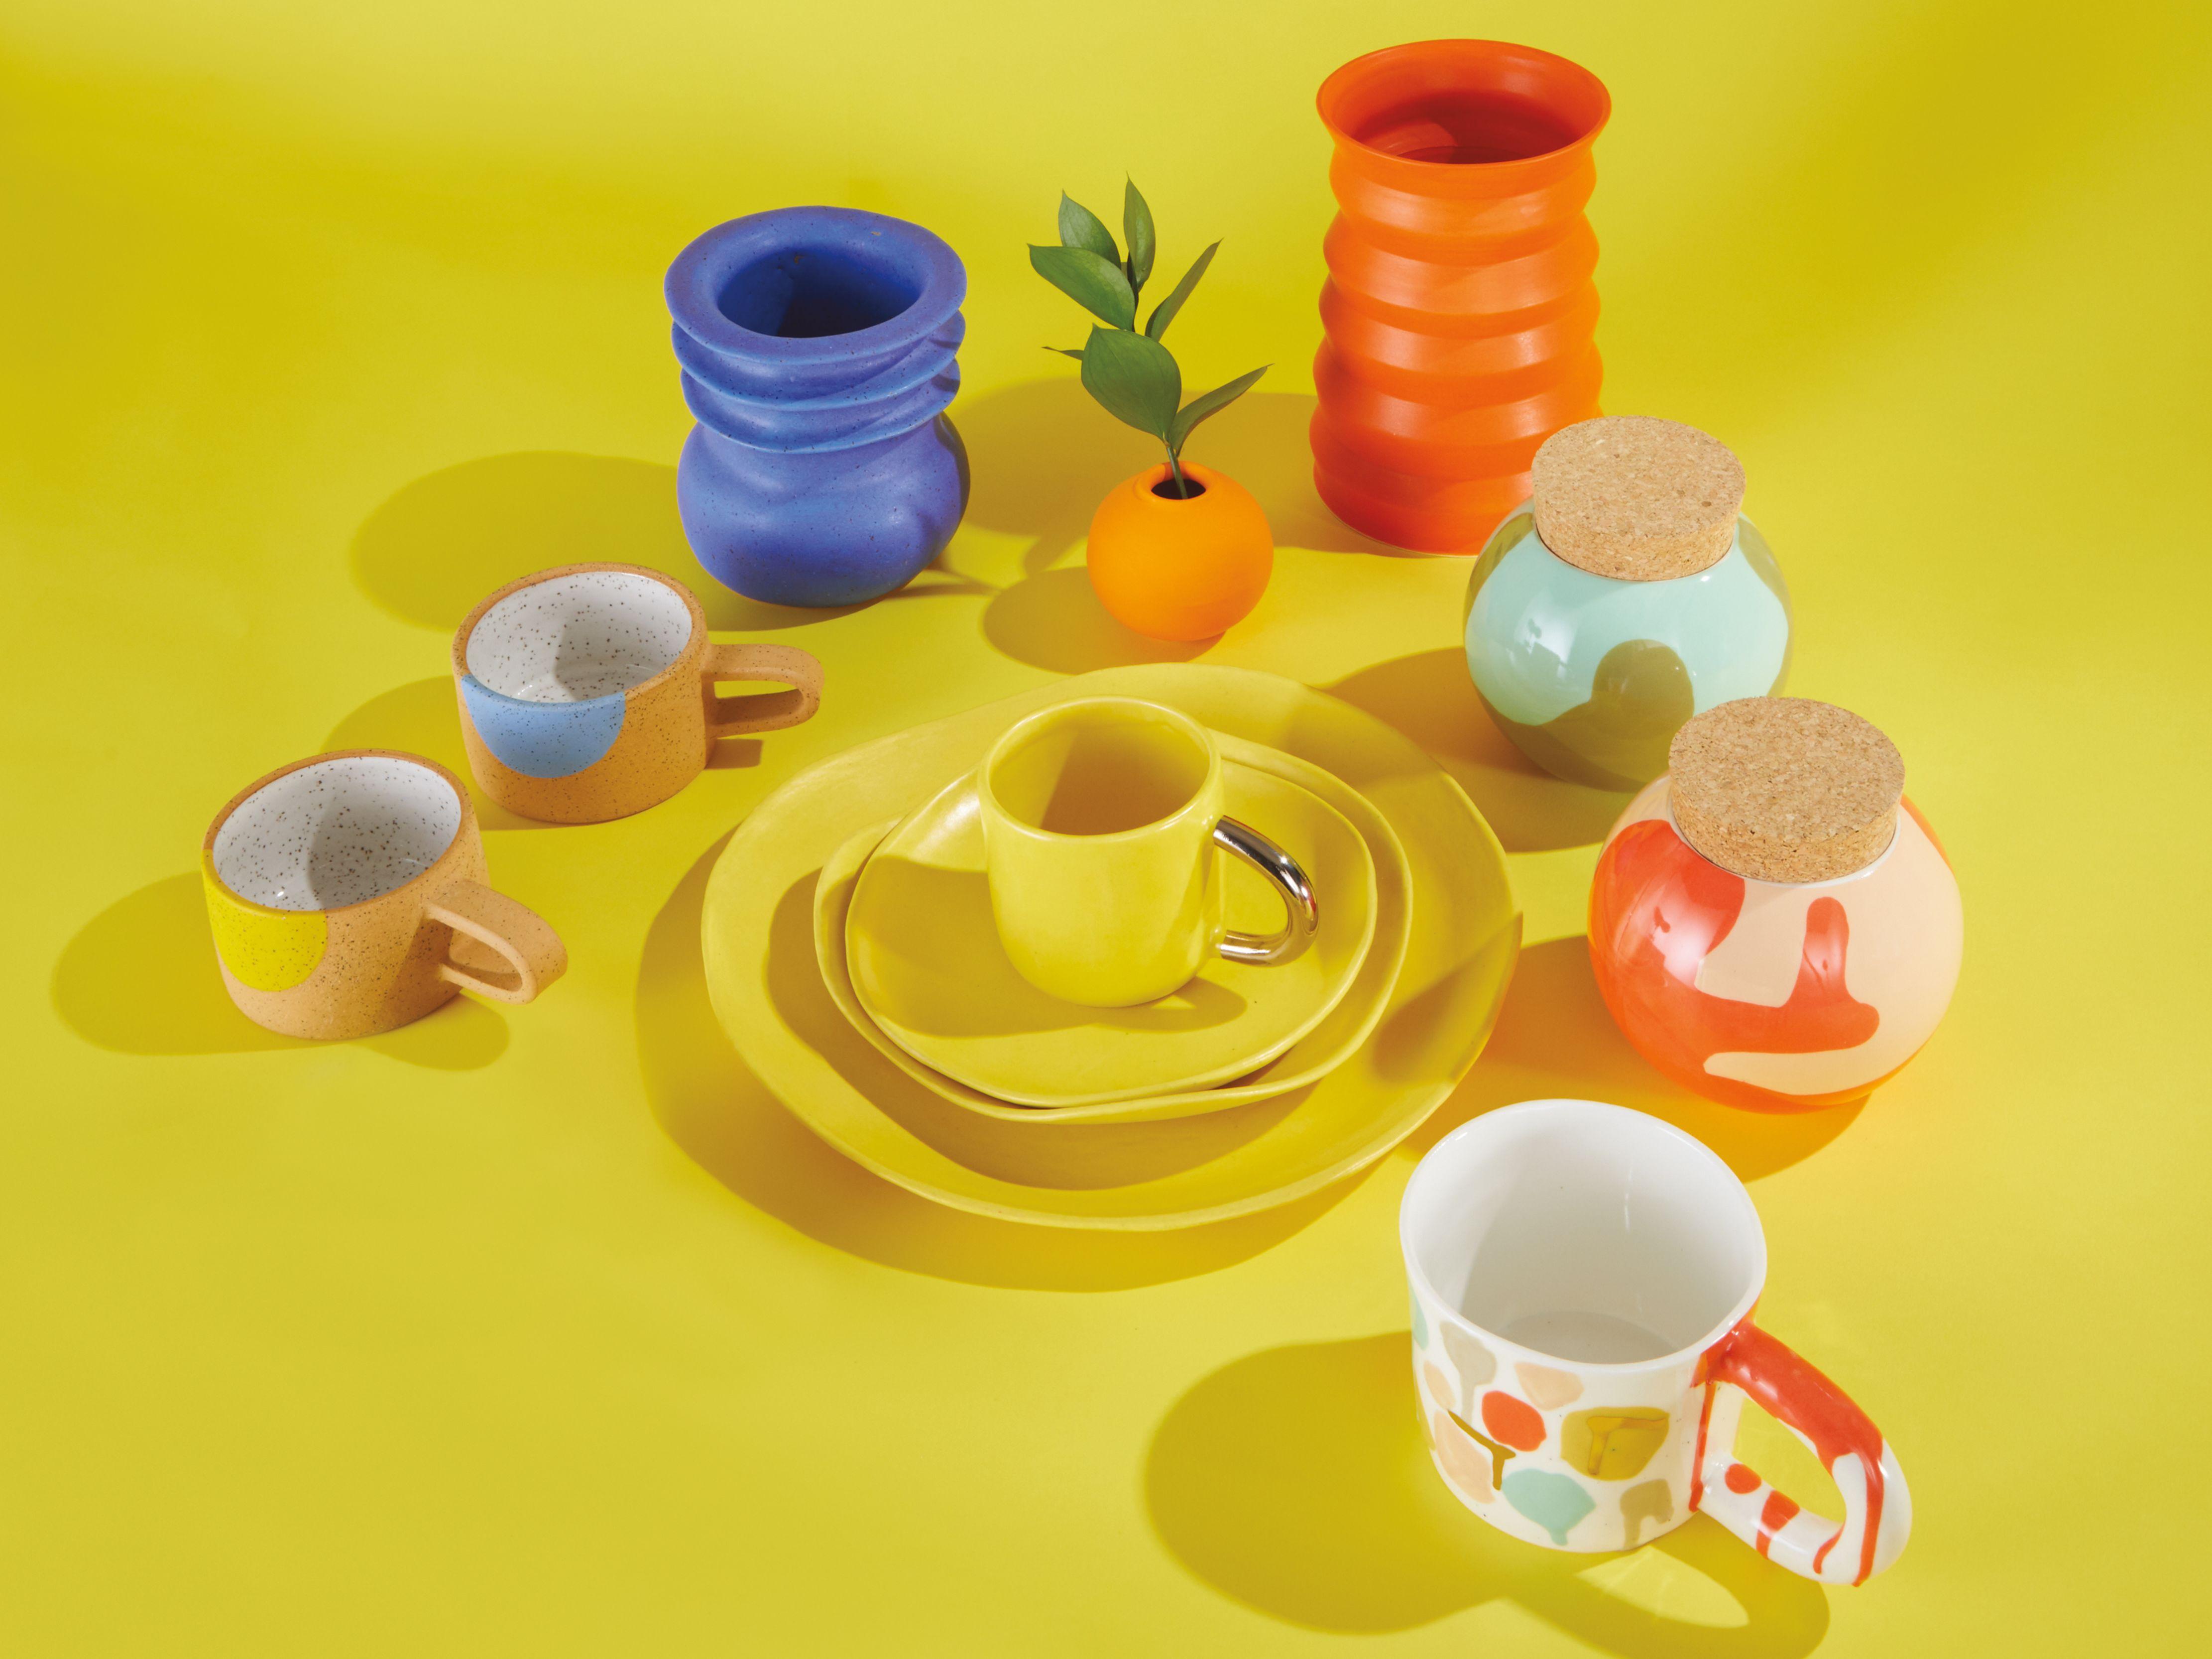 Da2017 ceramics bold q9bmw7